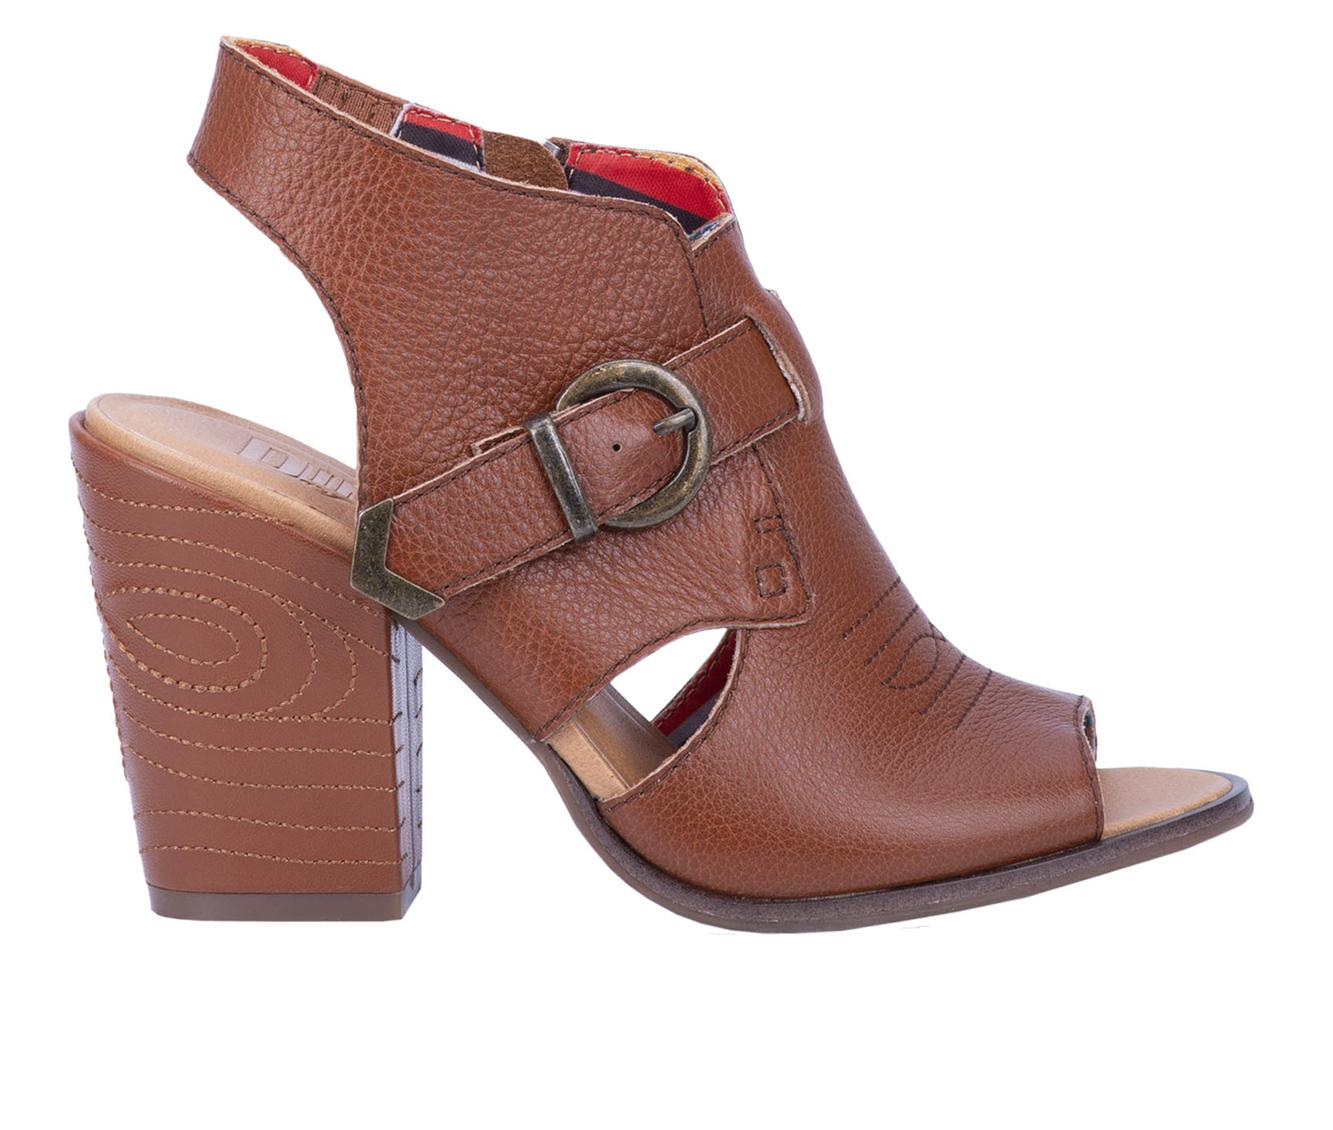 Dingo Boots Stirrup Women's Dress Shoe (Brown - Leather)